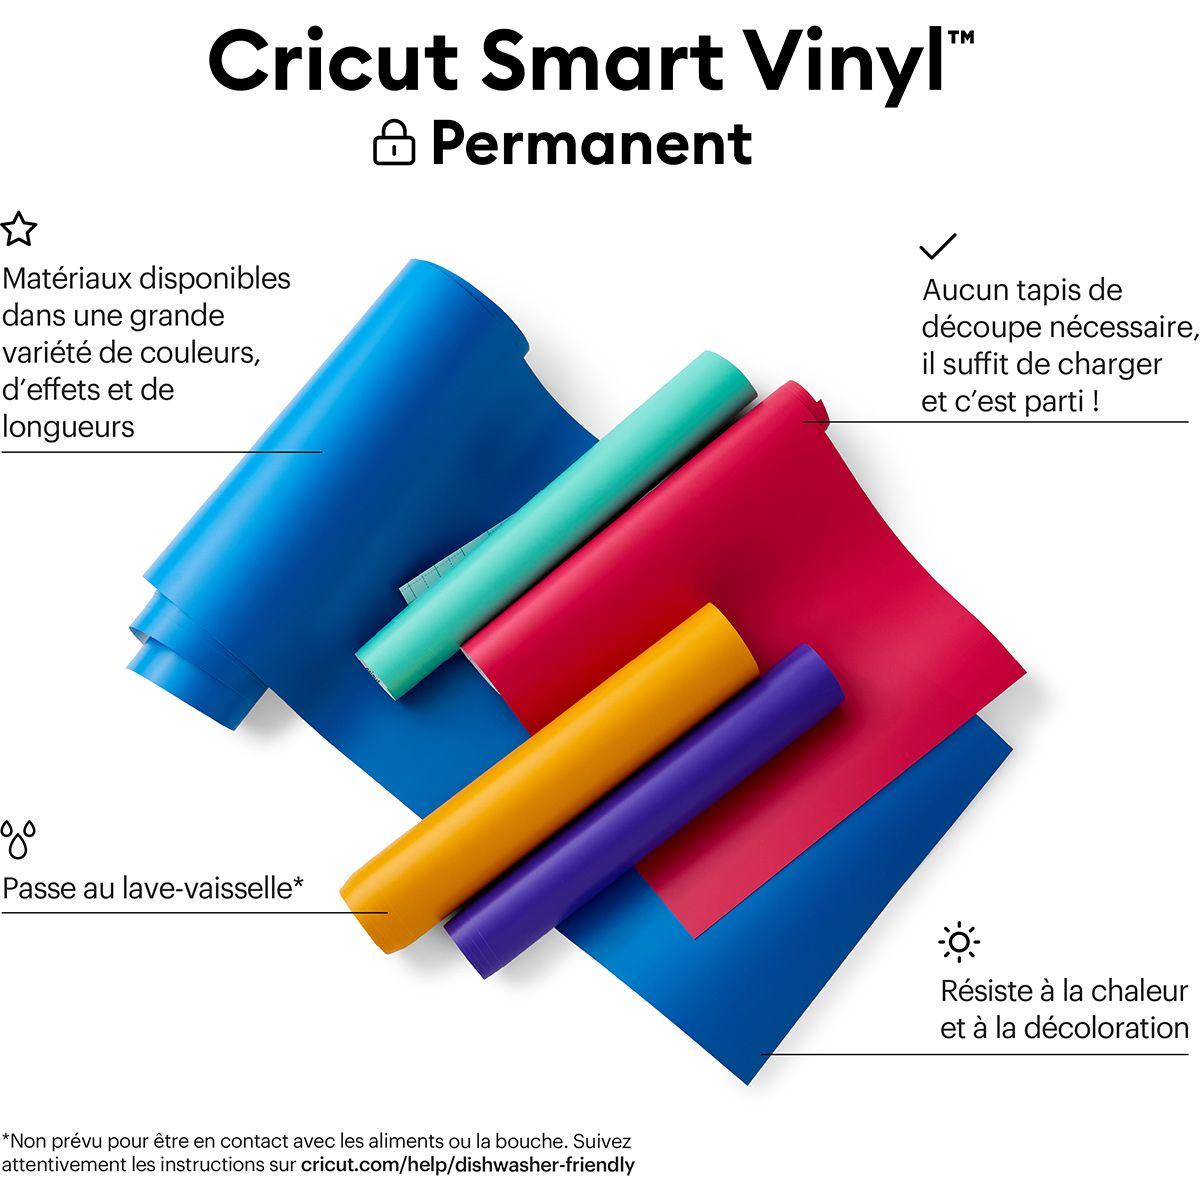 Film vinyle permanent 33 cm x 640 cm Cricut